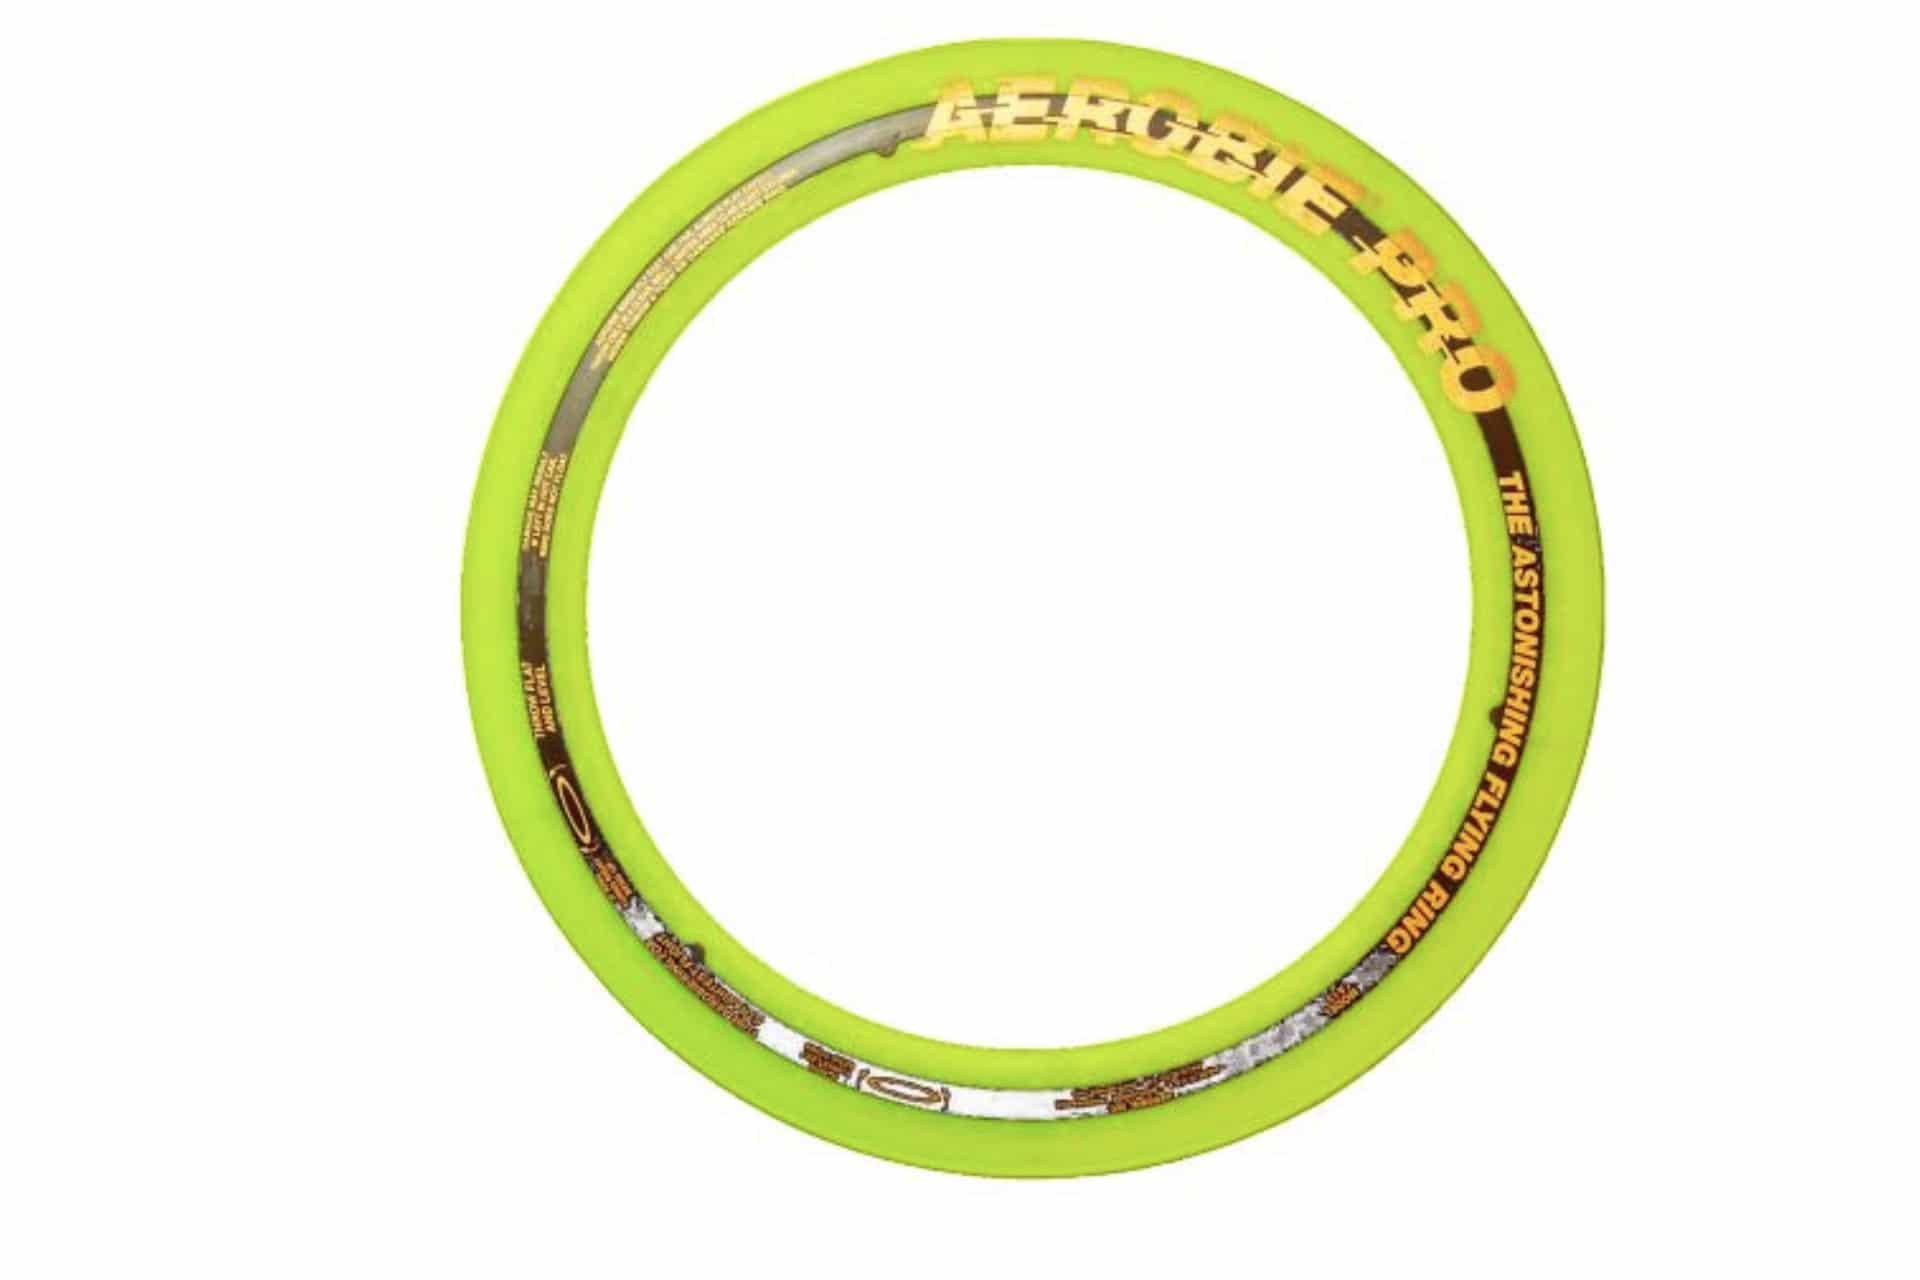 Neon yellow ring frisbee